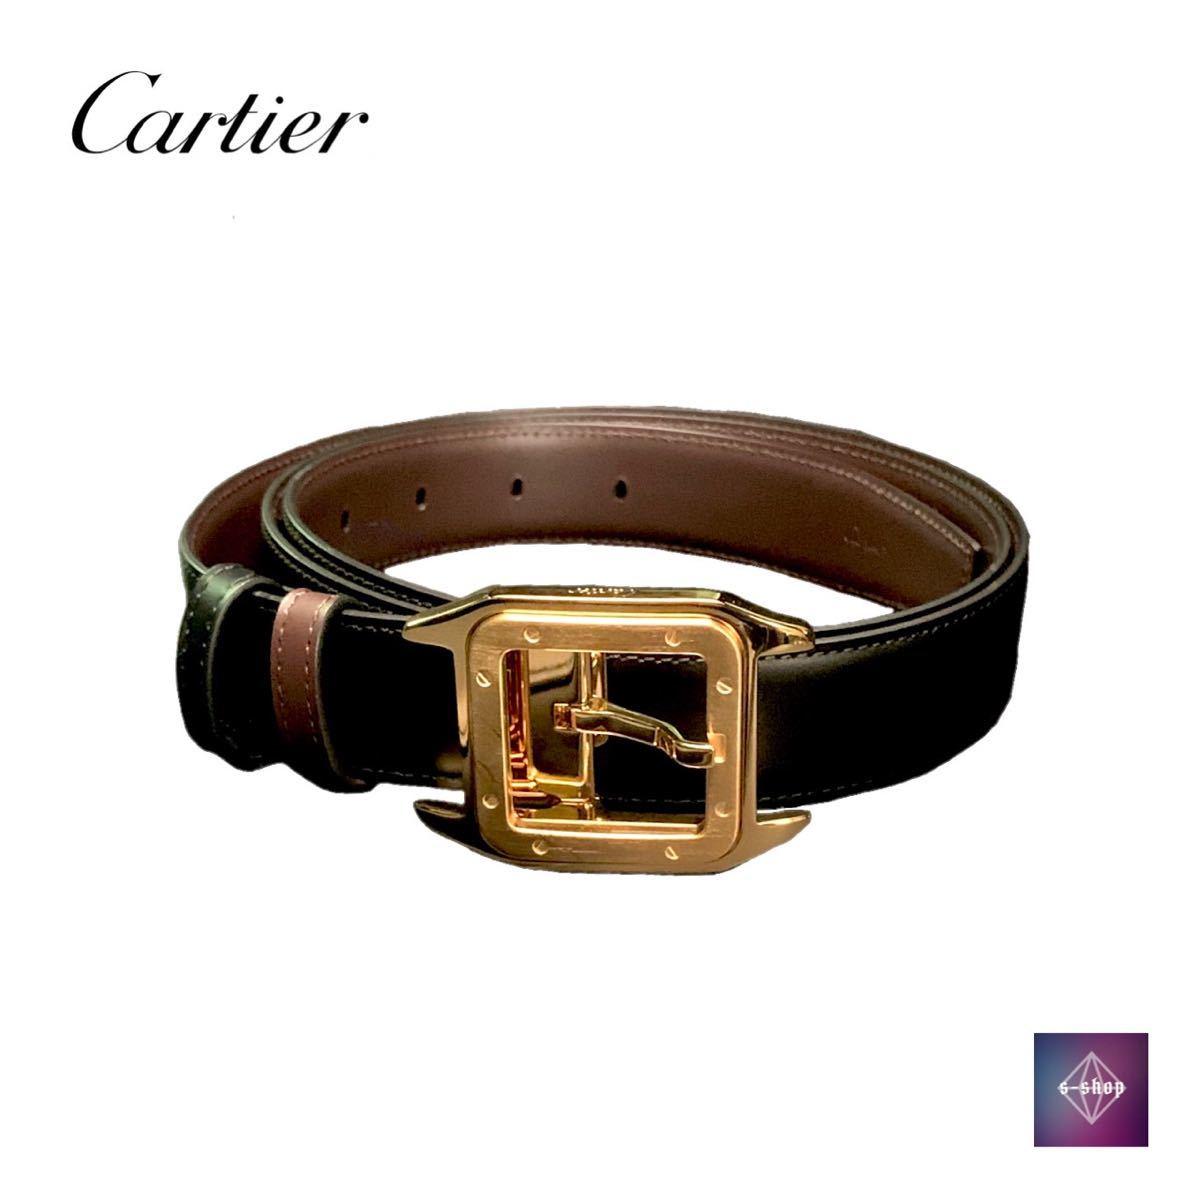 Cartier SANTOSの情報